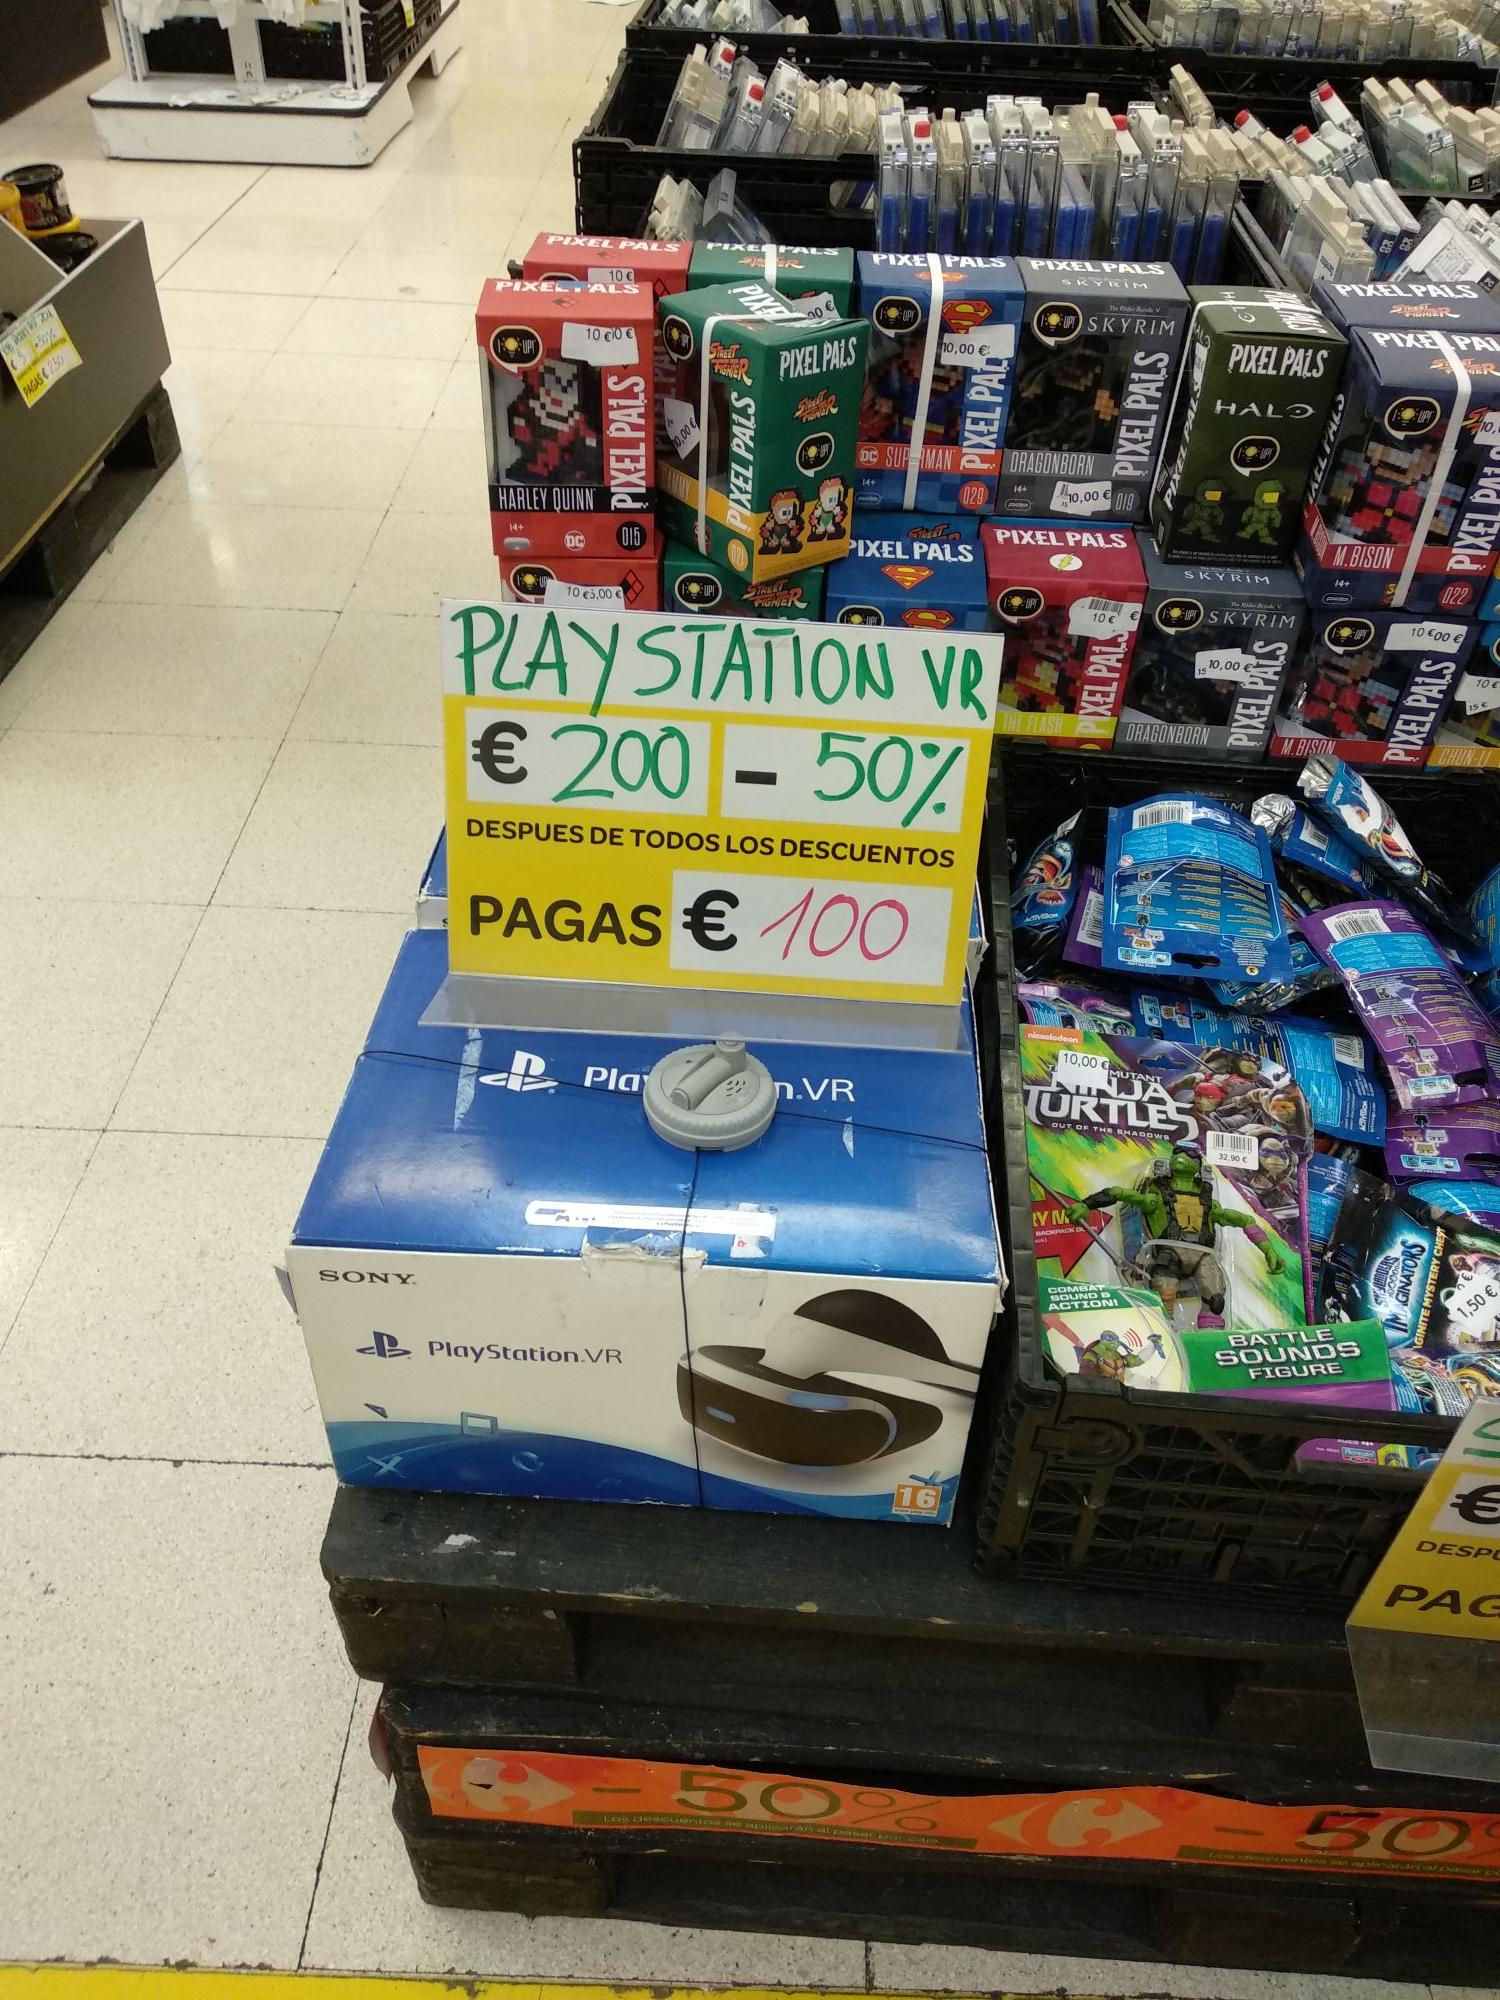 PlayStation Vr Carrefour de Zaragoza (Augusta)